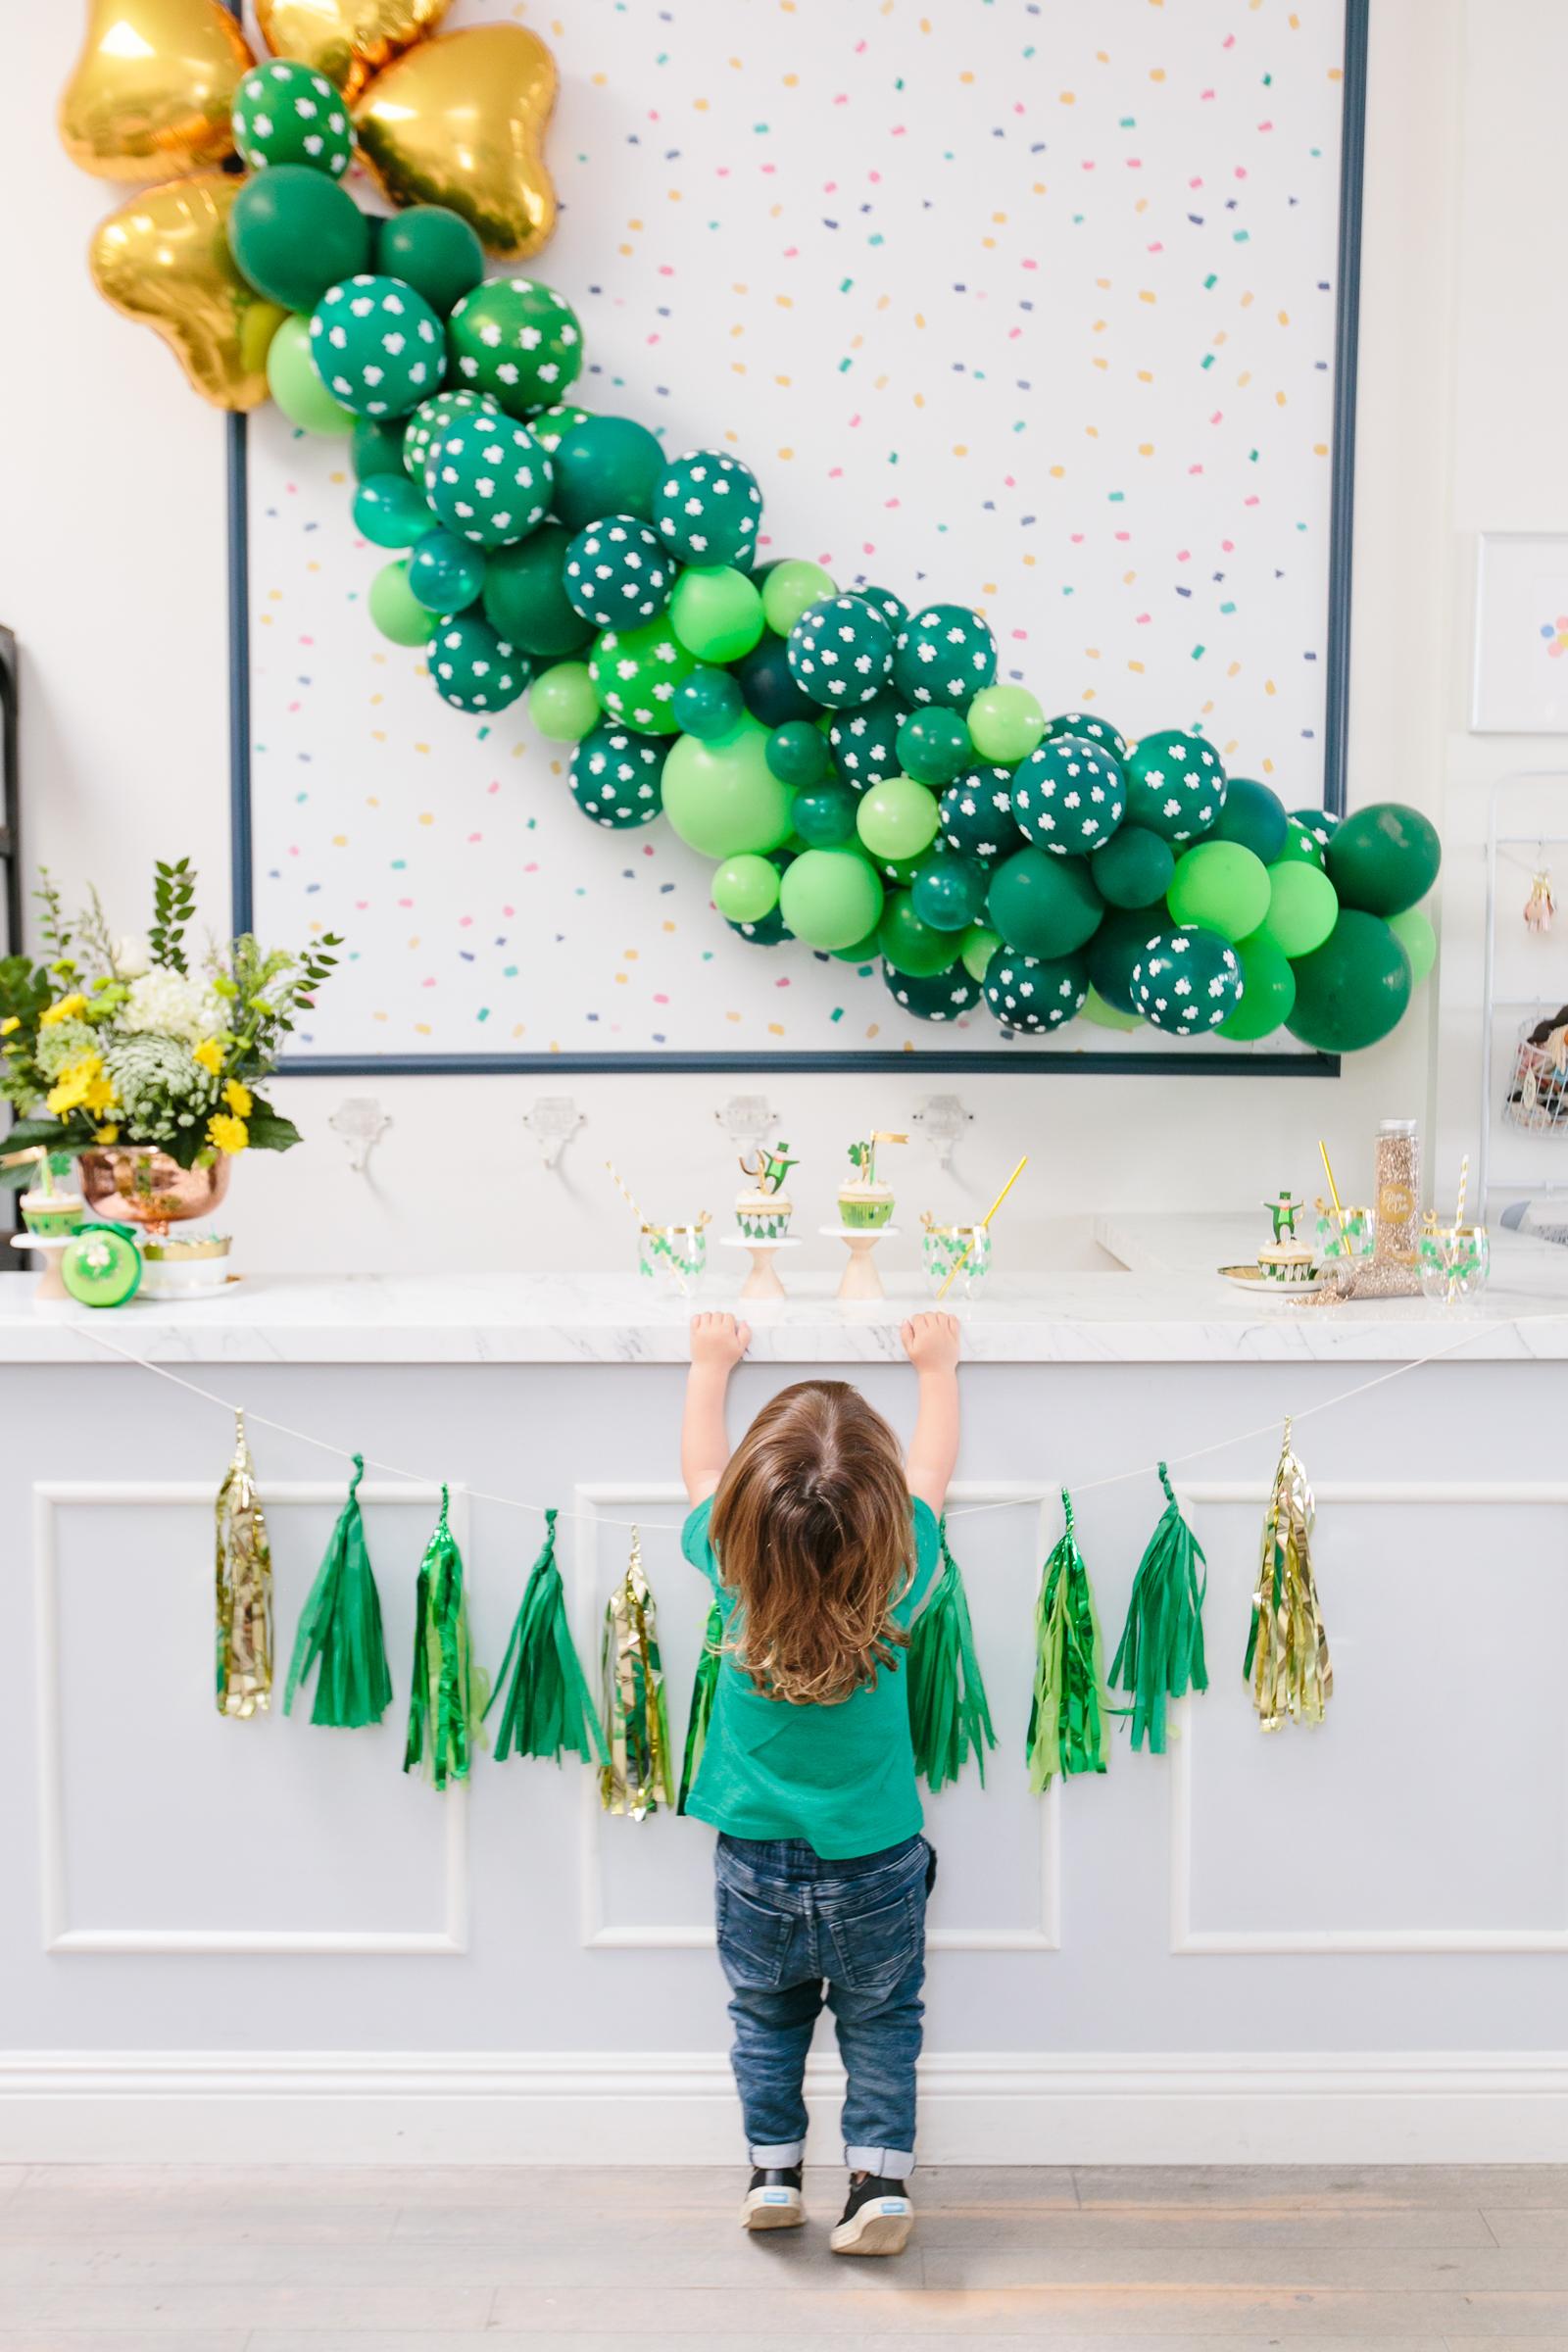 St. Patrick's Day Balloon Garland